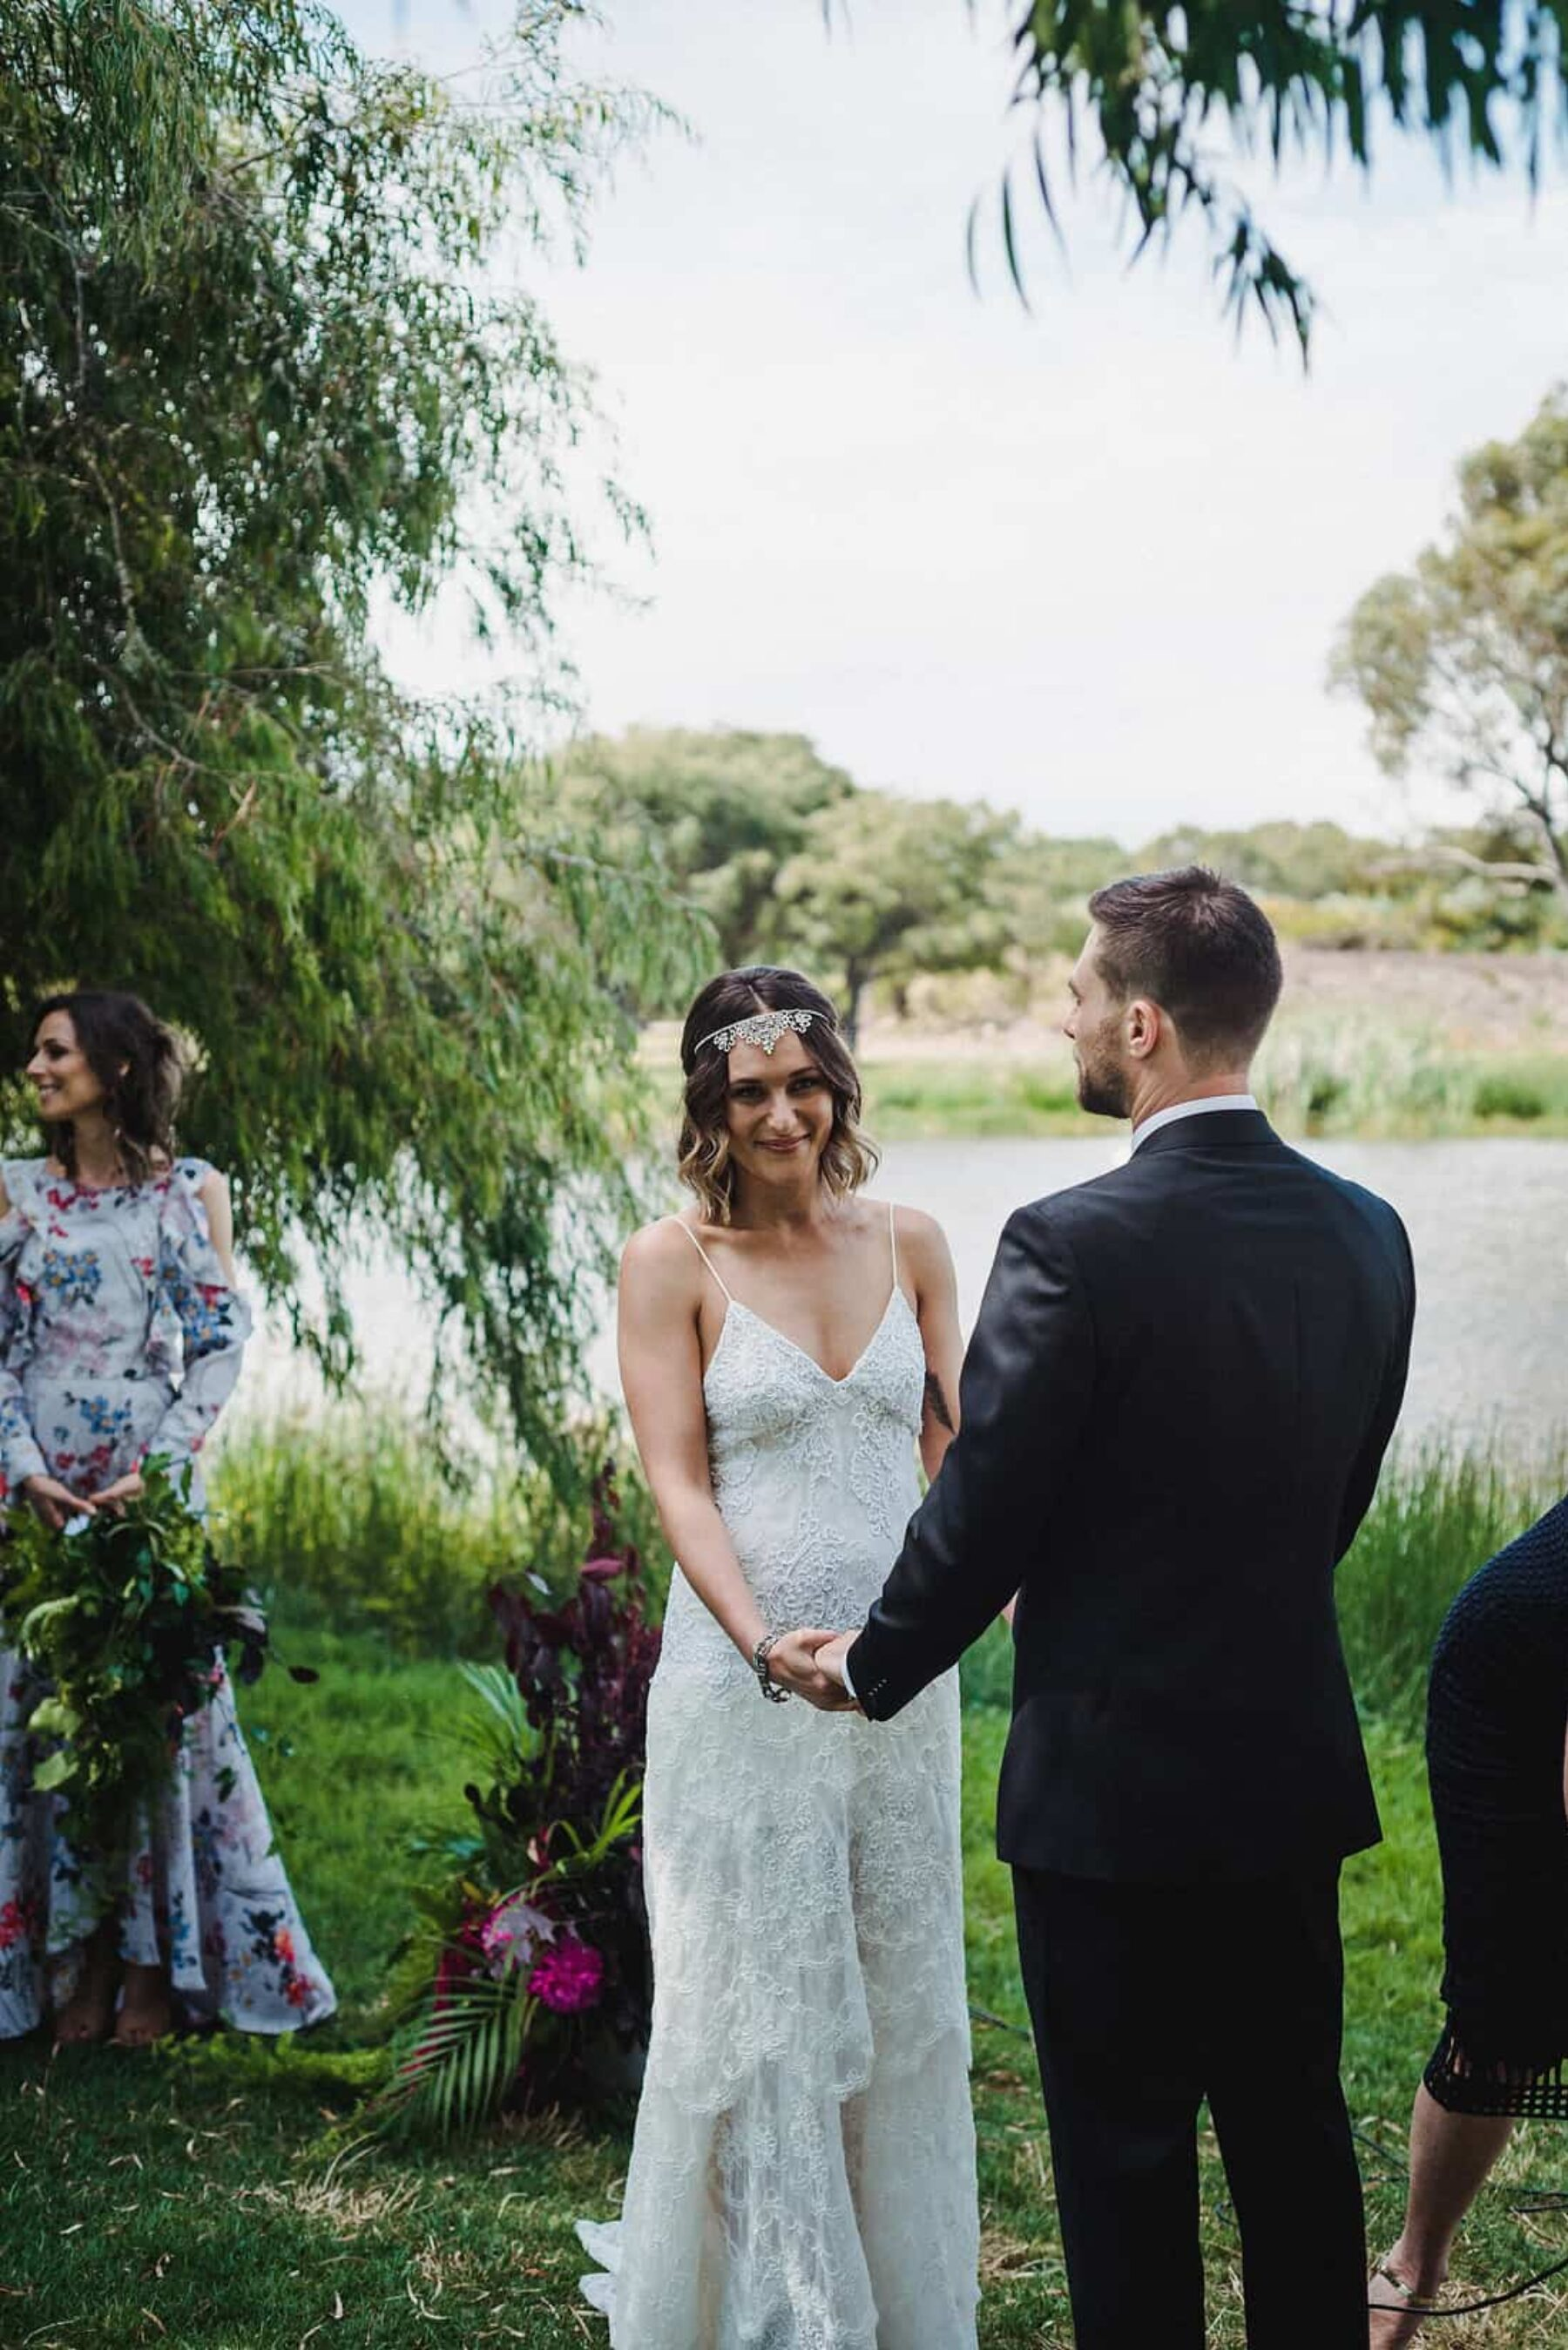 relaxed Perth backyard wedding - CJ Williams Photography